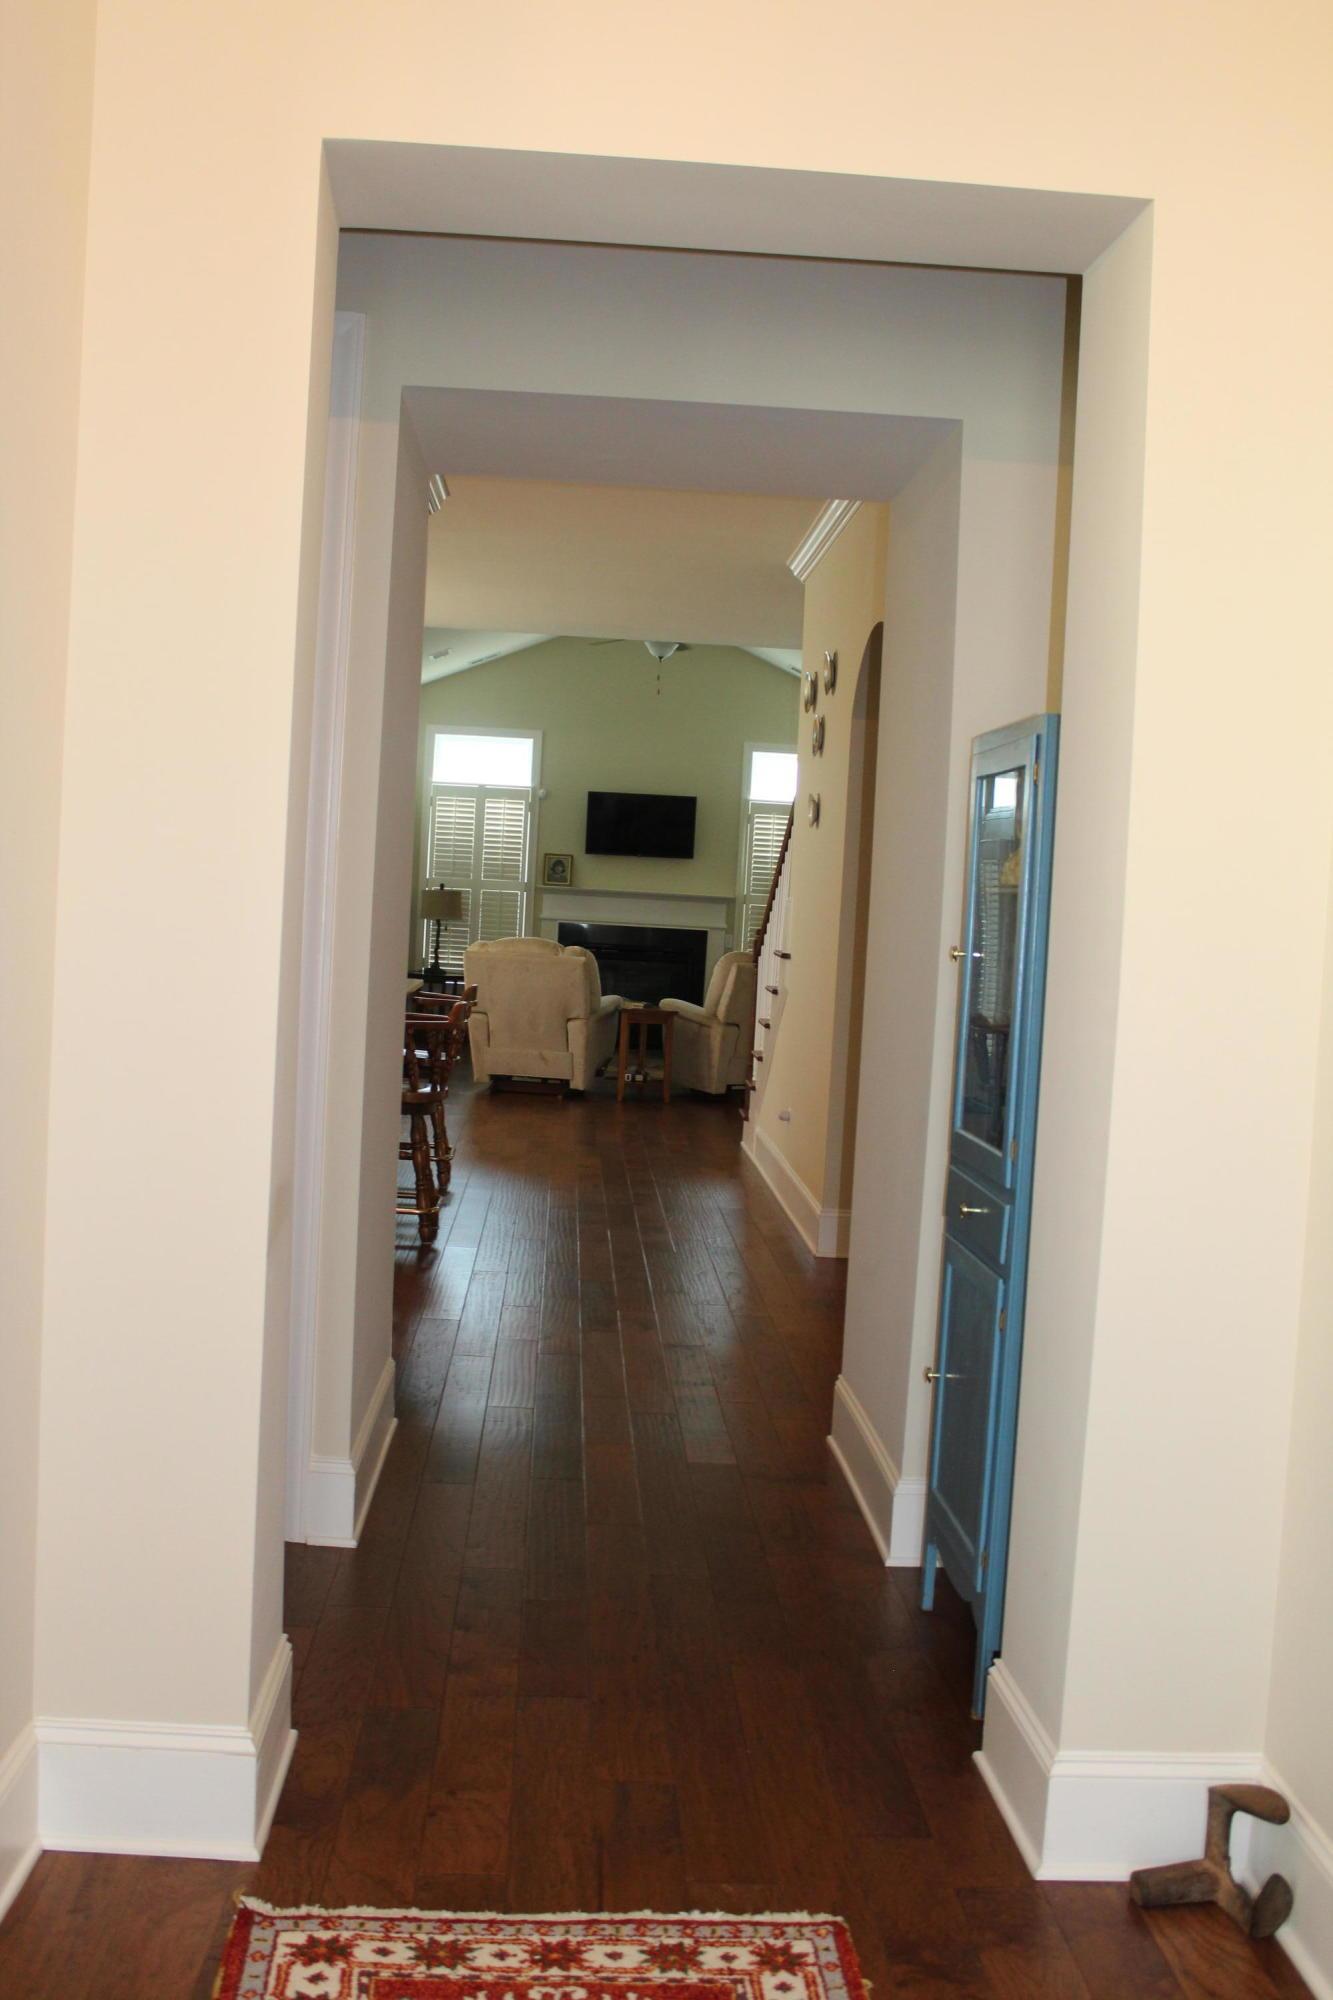 Dunes West Homes For Sale - 1403 Masthead, Mount Pleasant, SC - 29